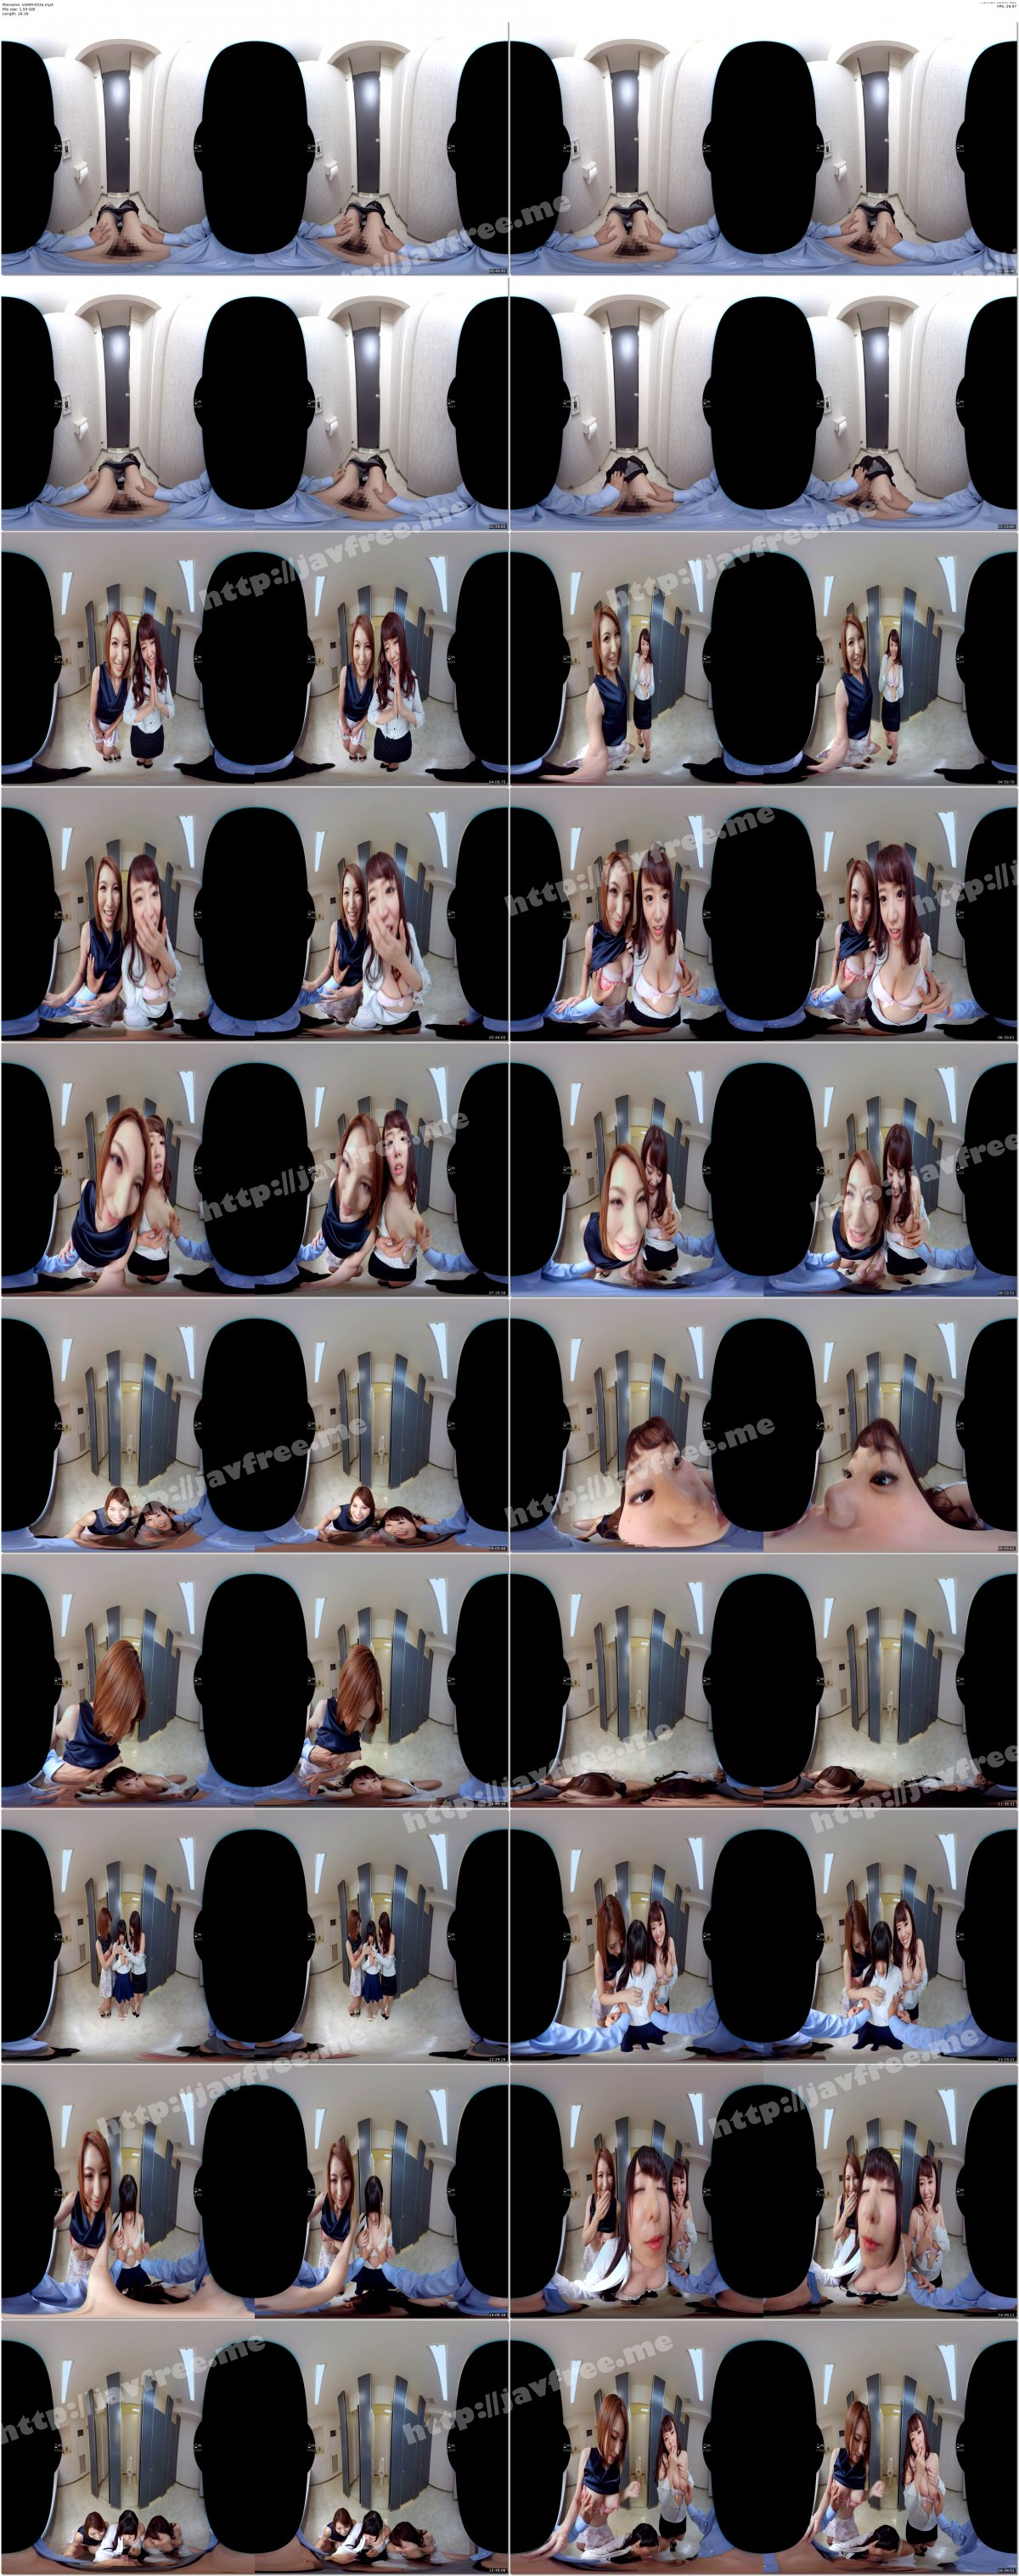 [VARM-033] 【VR】間違えて入った女子トイレで密着SEX - image VARM-033a on https://javfree.me